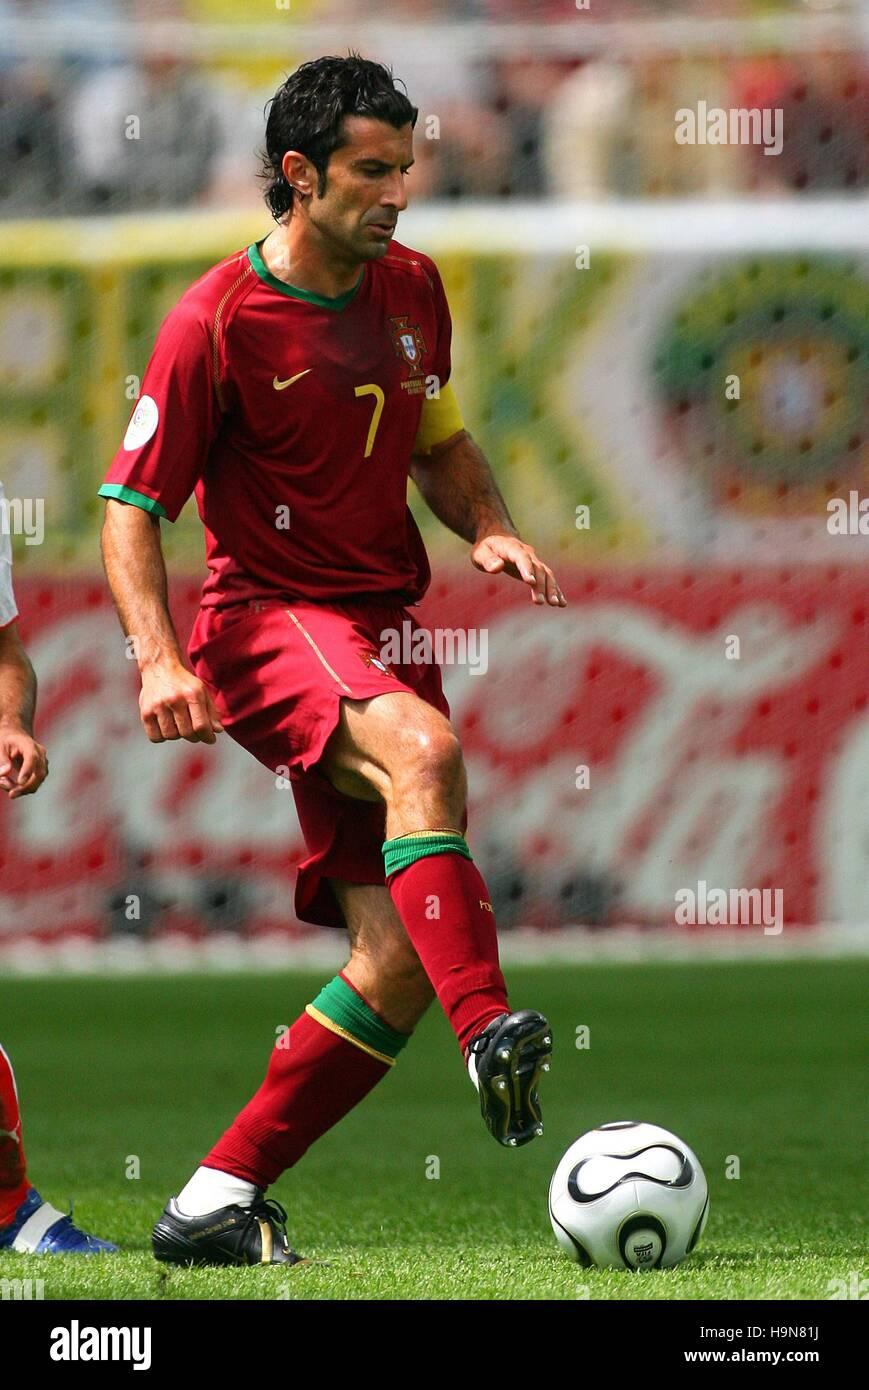 LUIS FIGO PORTUGAL & INTER MILAN WORLD CUP FRANKFURT GERMANY 17